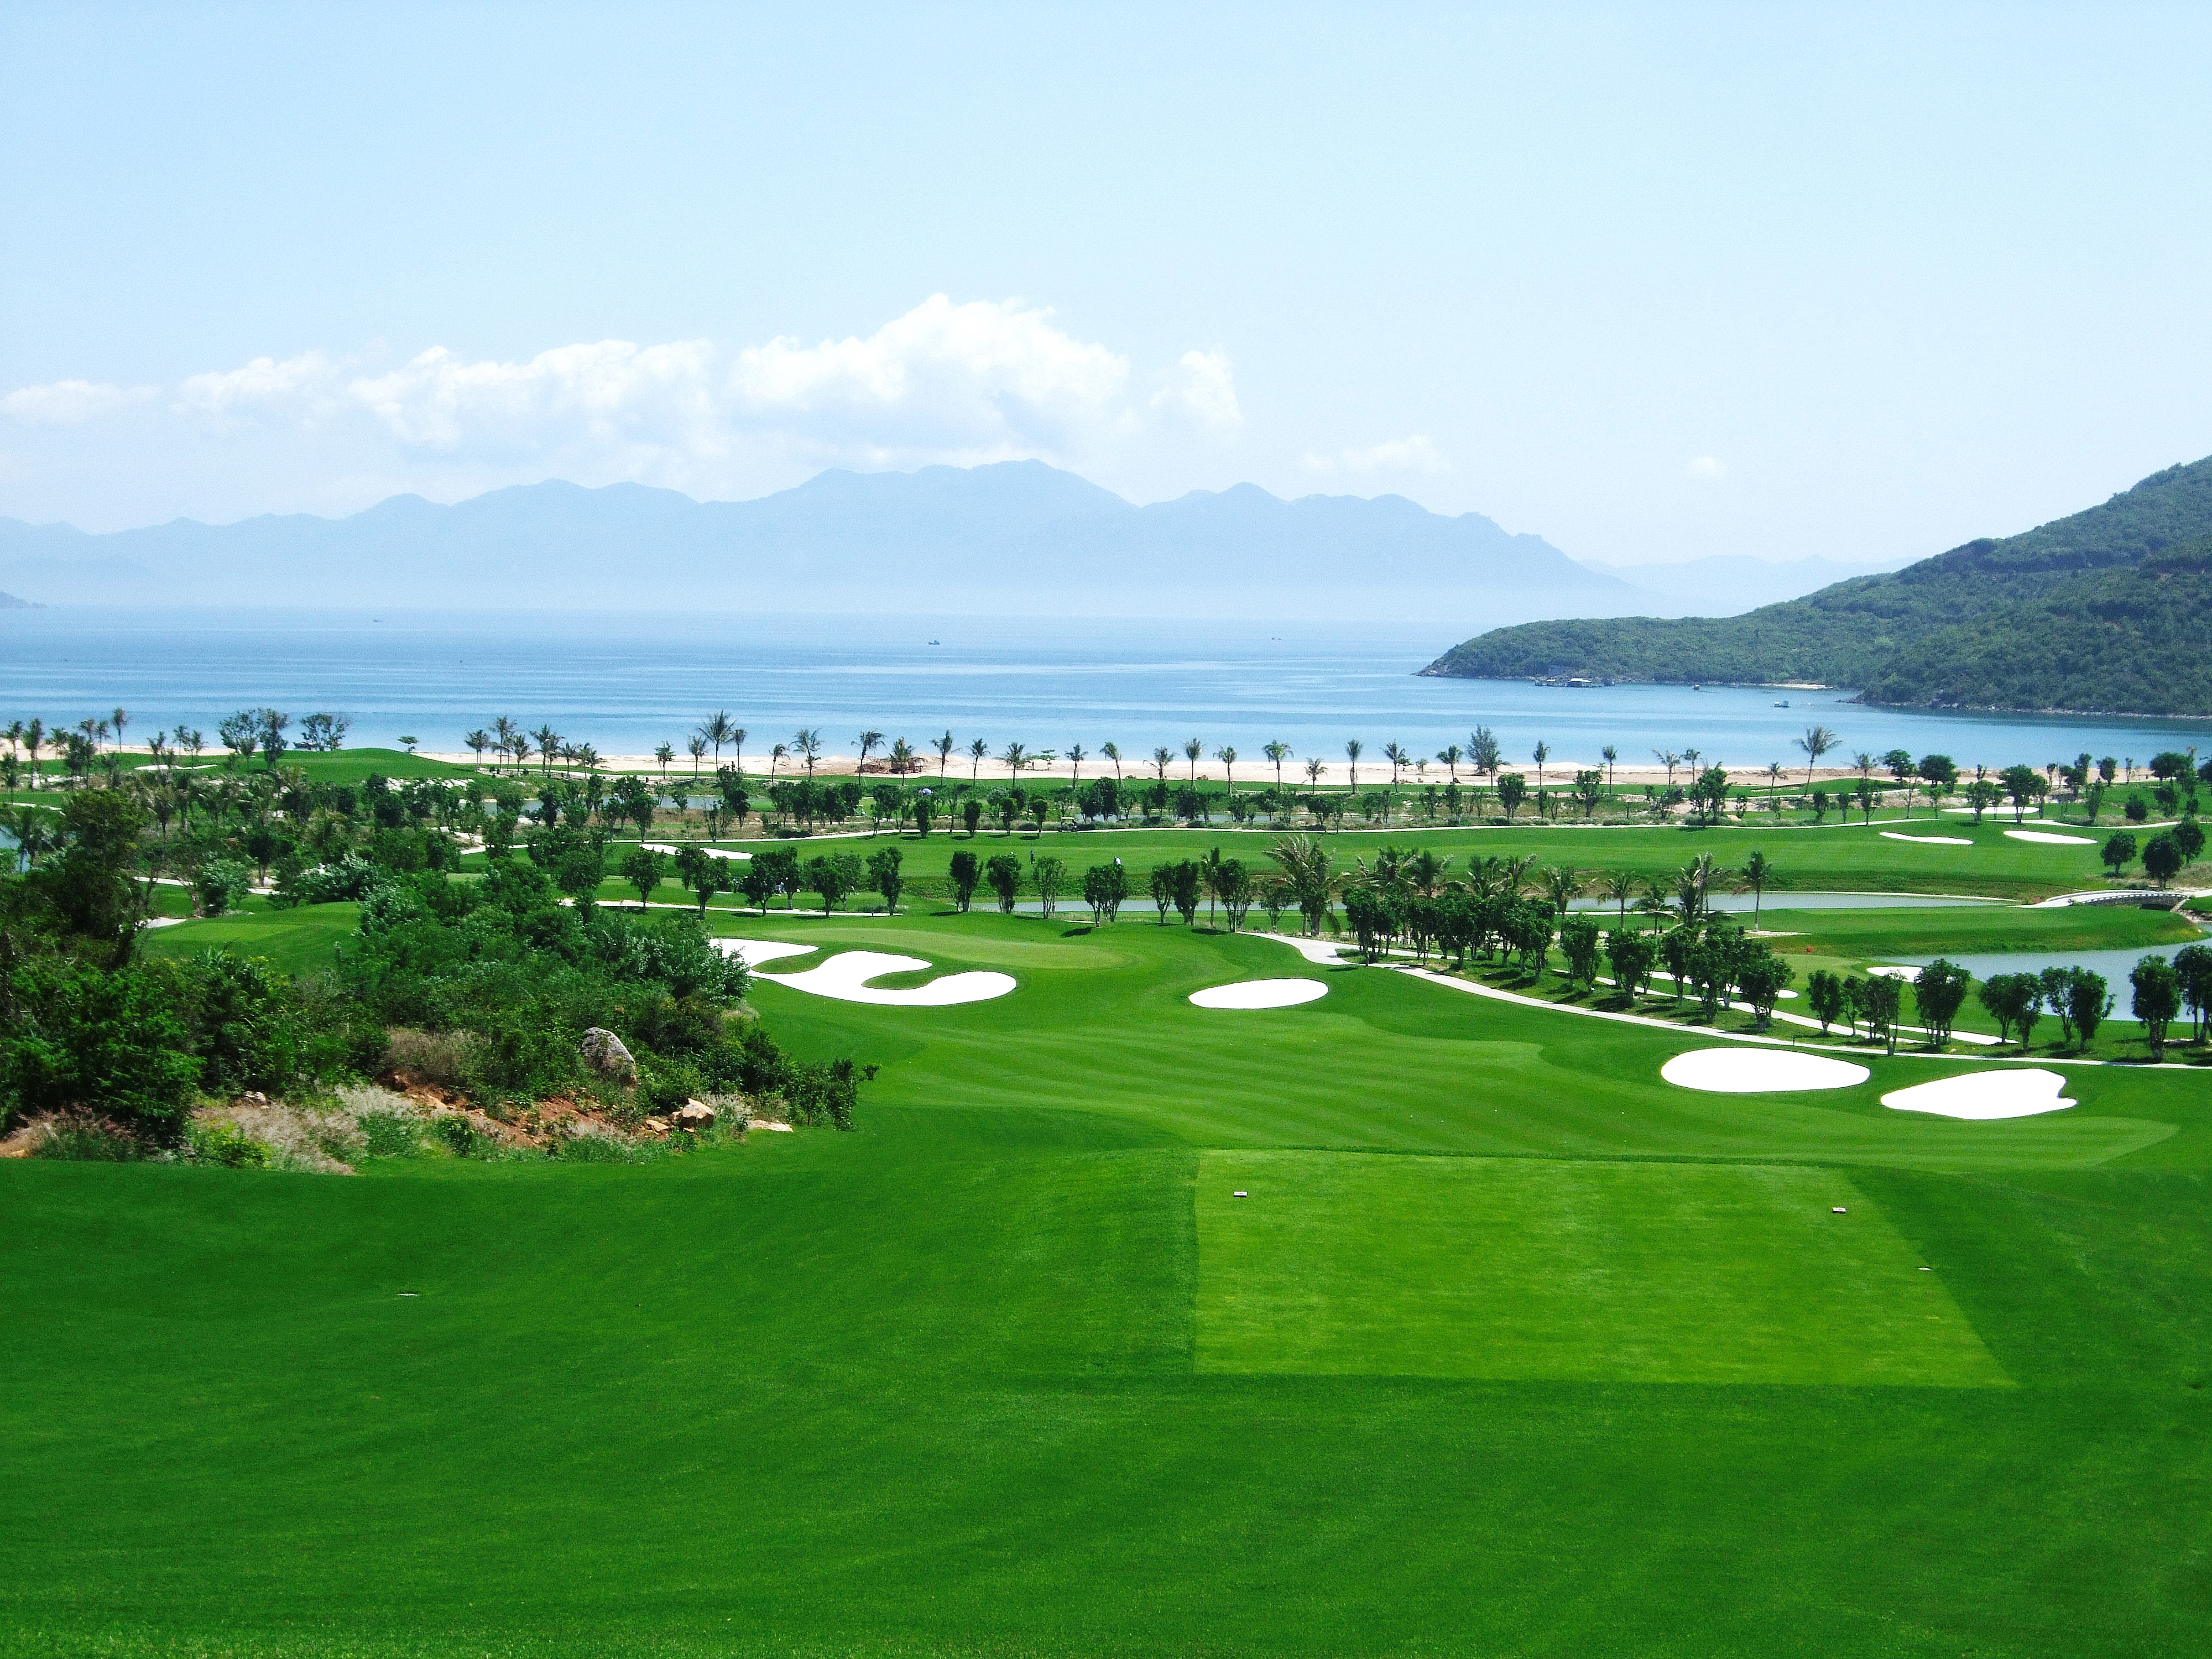 https://bubo.sk/uploads/galleries/7454/vinpearl-golf-club.jpg